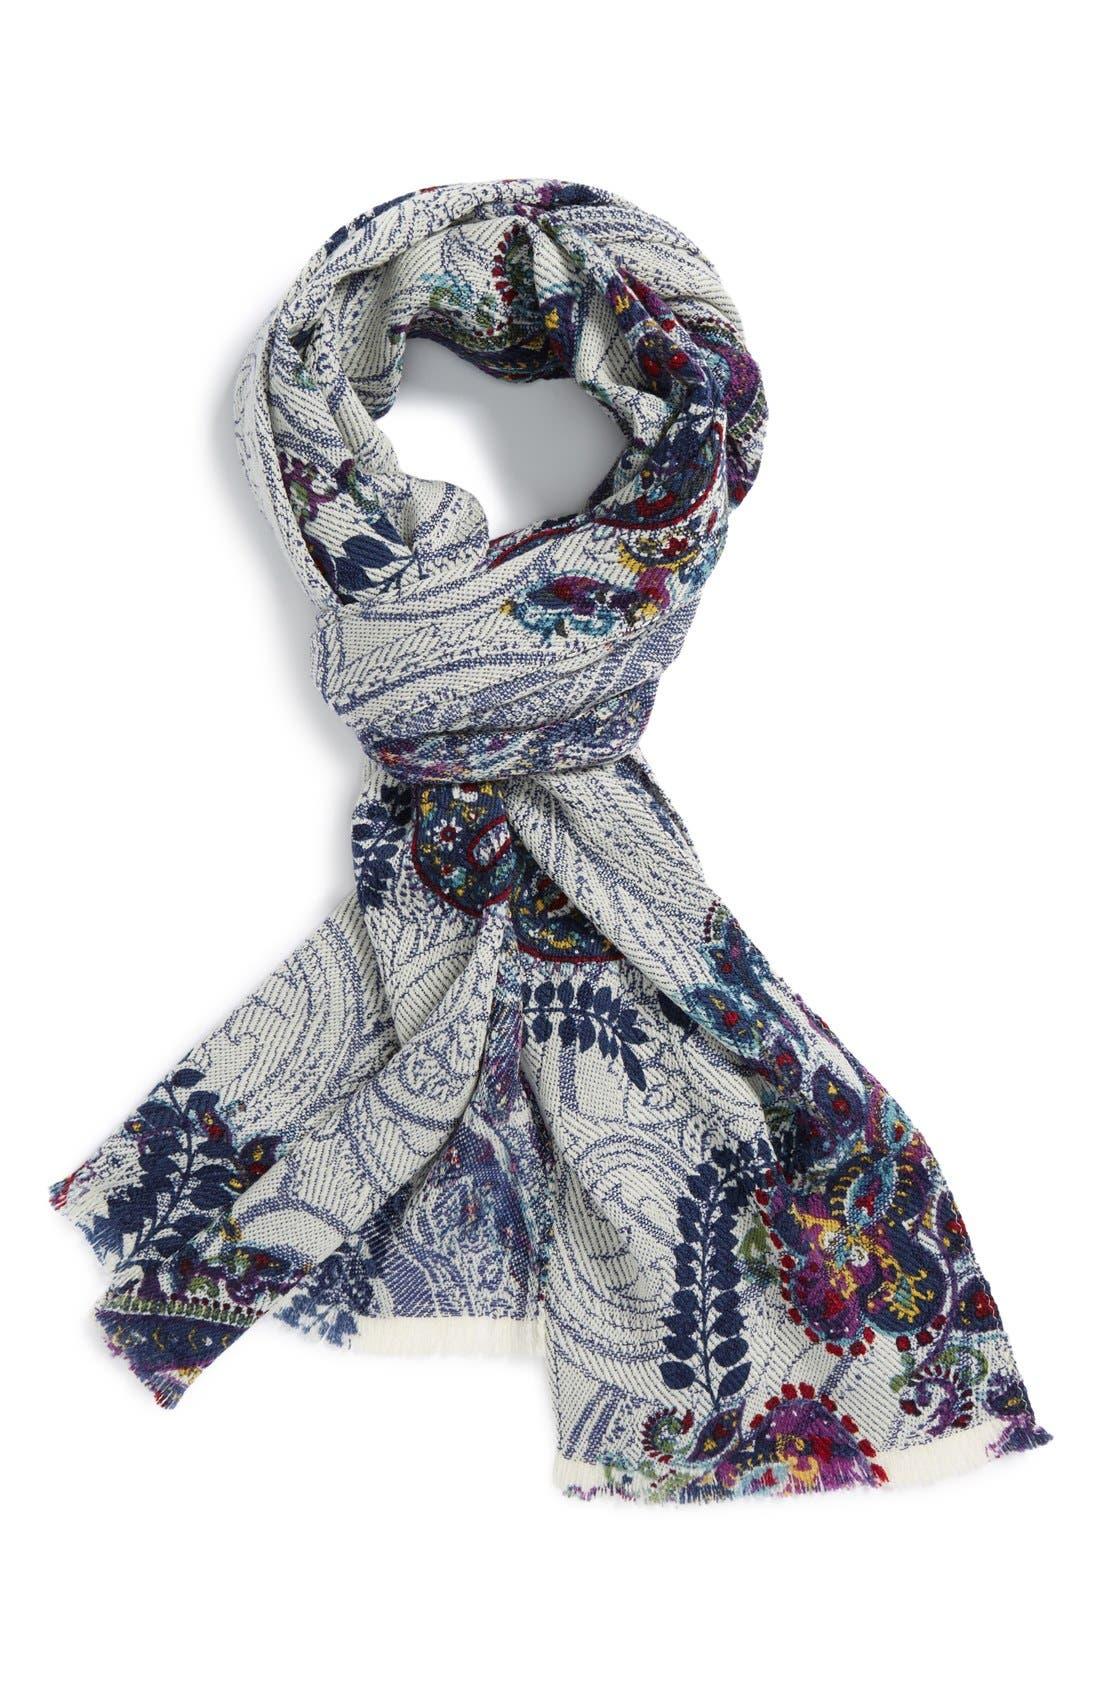 Main Image - Etro Print Wool Knit Scarf